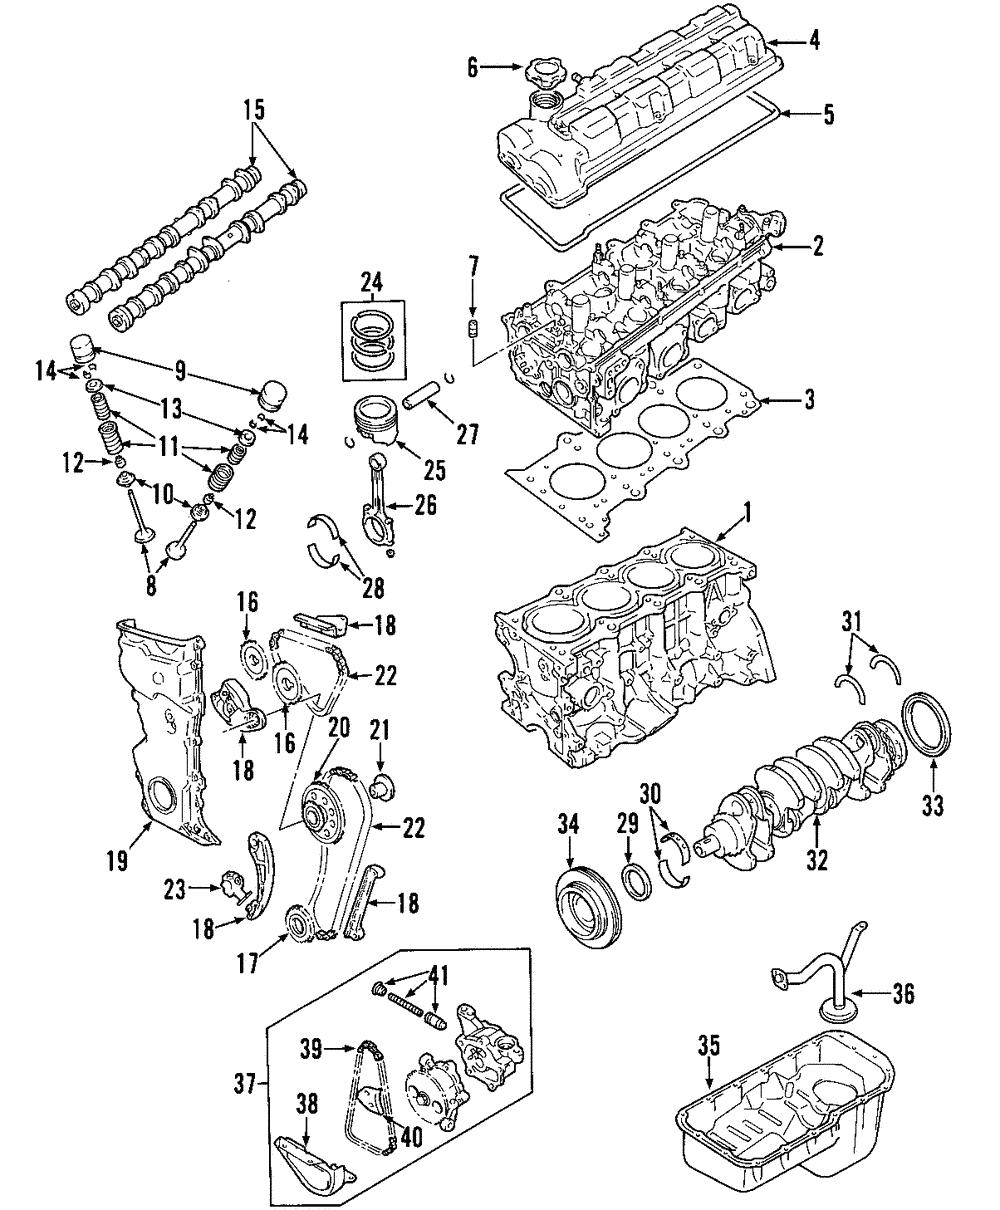 Genuine GM Piston 91177381